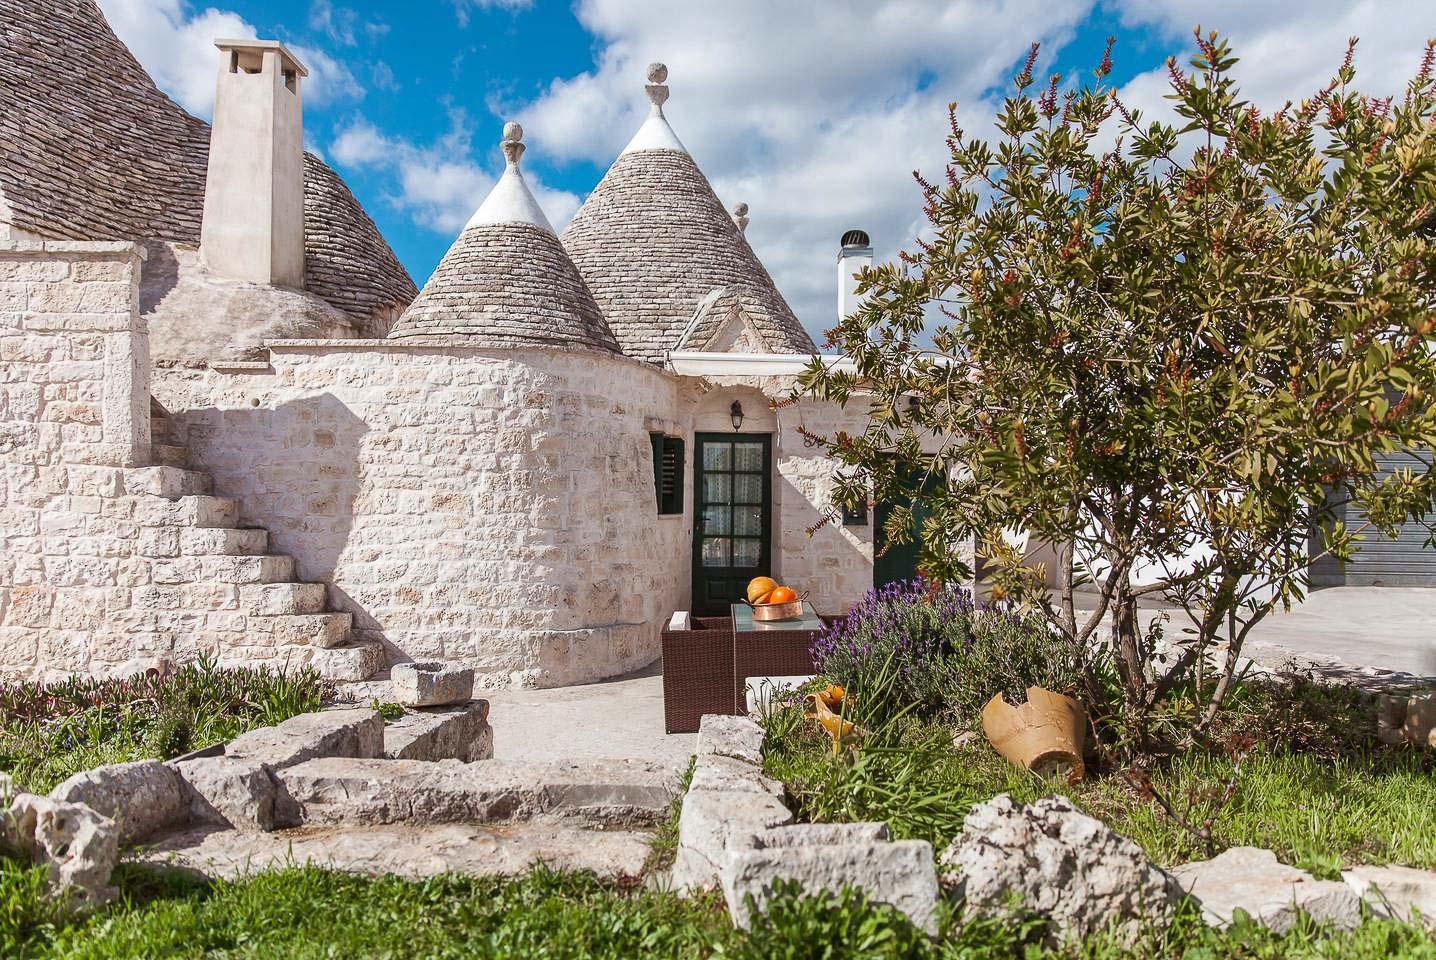 ckanani-wheretostayinpuglia-Airbnb1.jpg